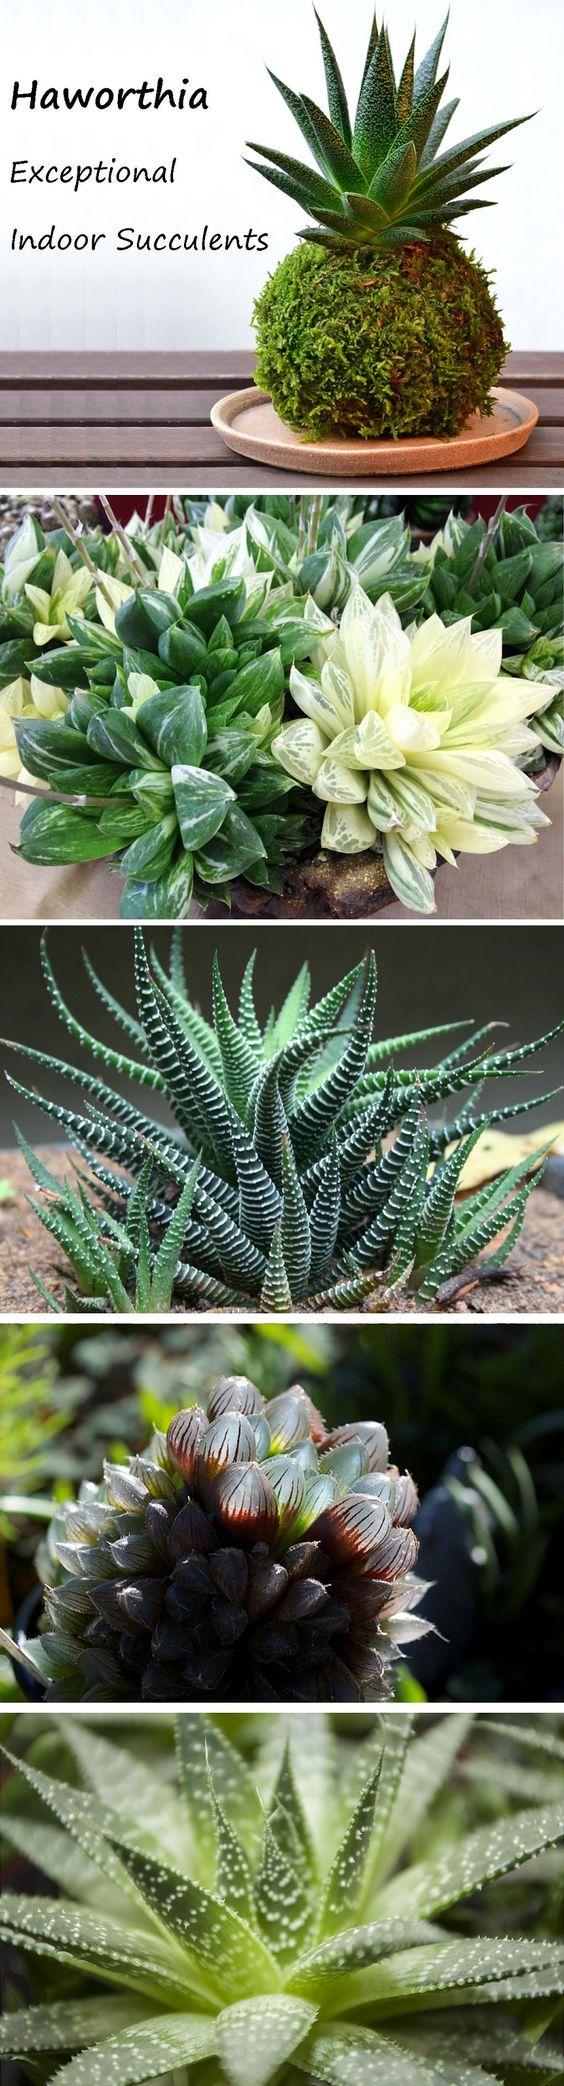 Haworthia  - 完美的室内肉质植物 - 小,生长缓慢,低光照需求和极具观赏性。易护理室内多肉植物。